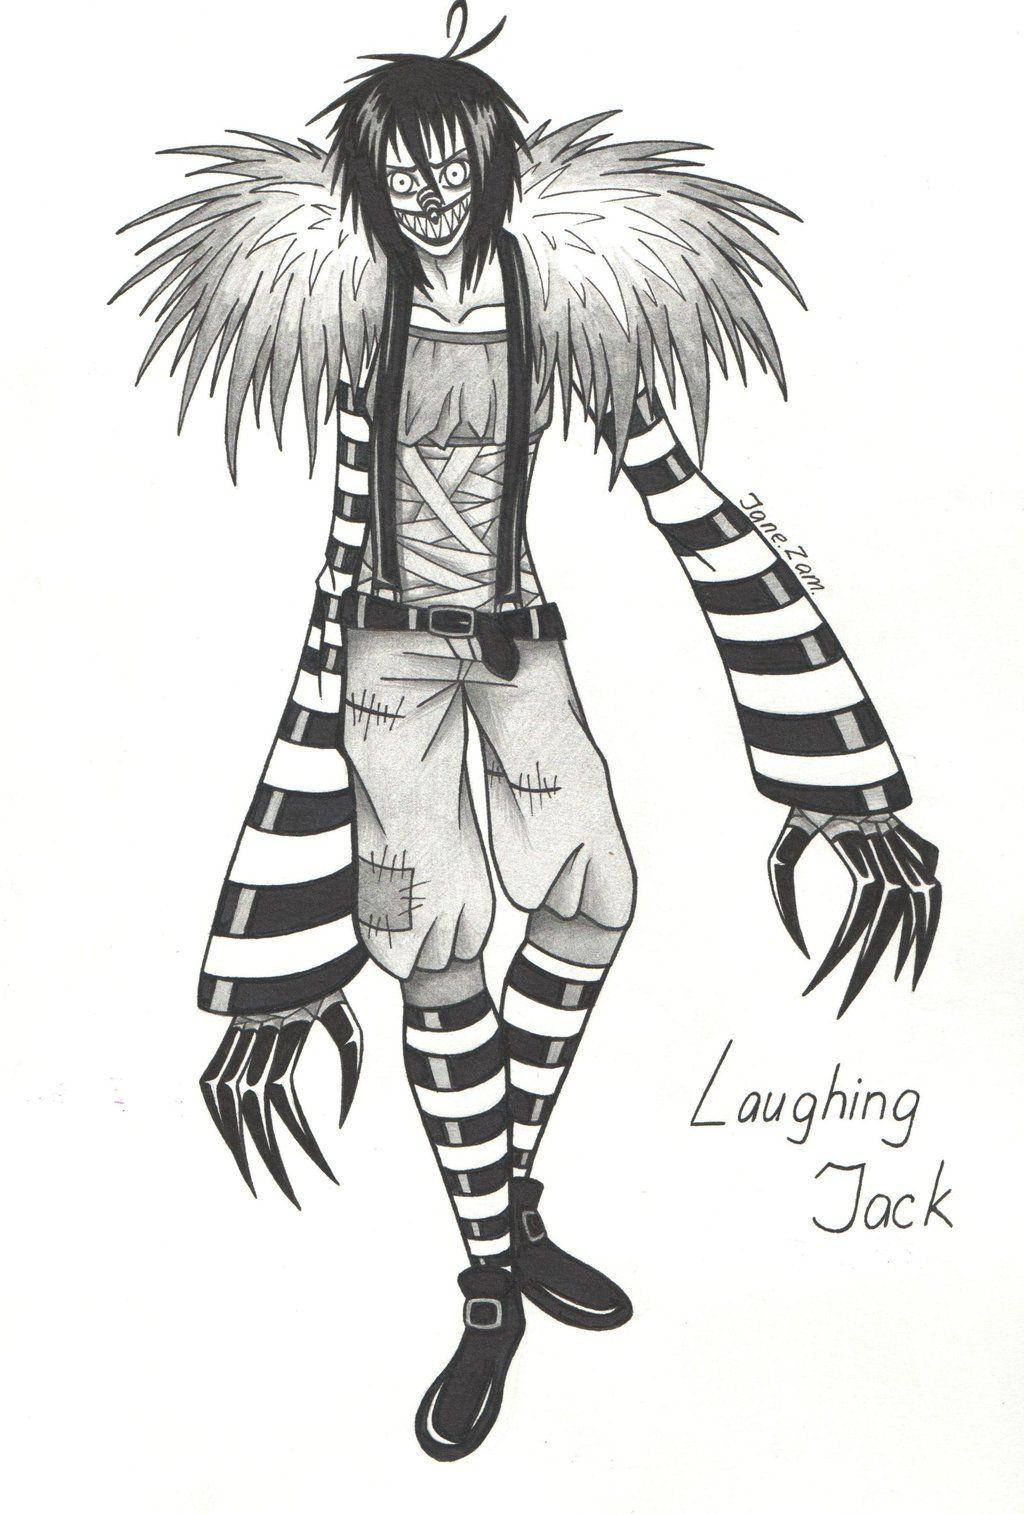 Laughing Jack Drawings Laughing Jack Jack Creepypasta Creepy Drawings